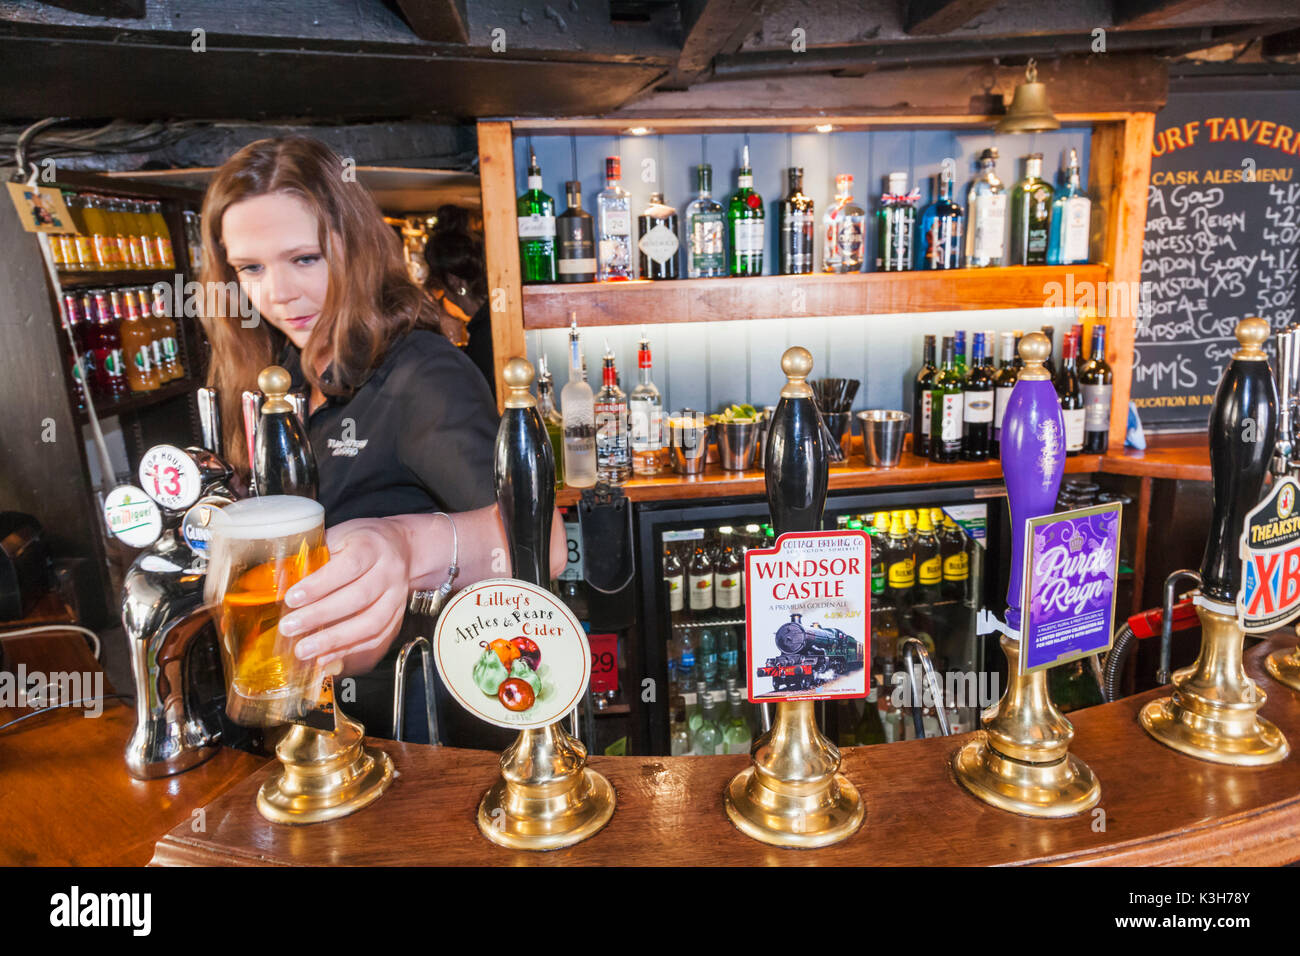 England, Oxfordshire, Oxford, Turf Tavern Pub, Bar Scene - Stock Image